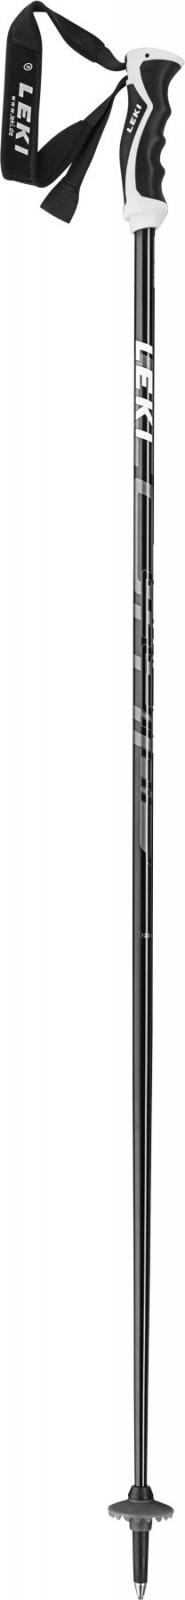 Leki Comp 16C